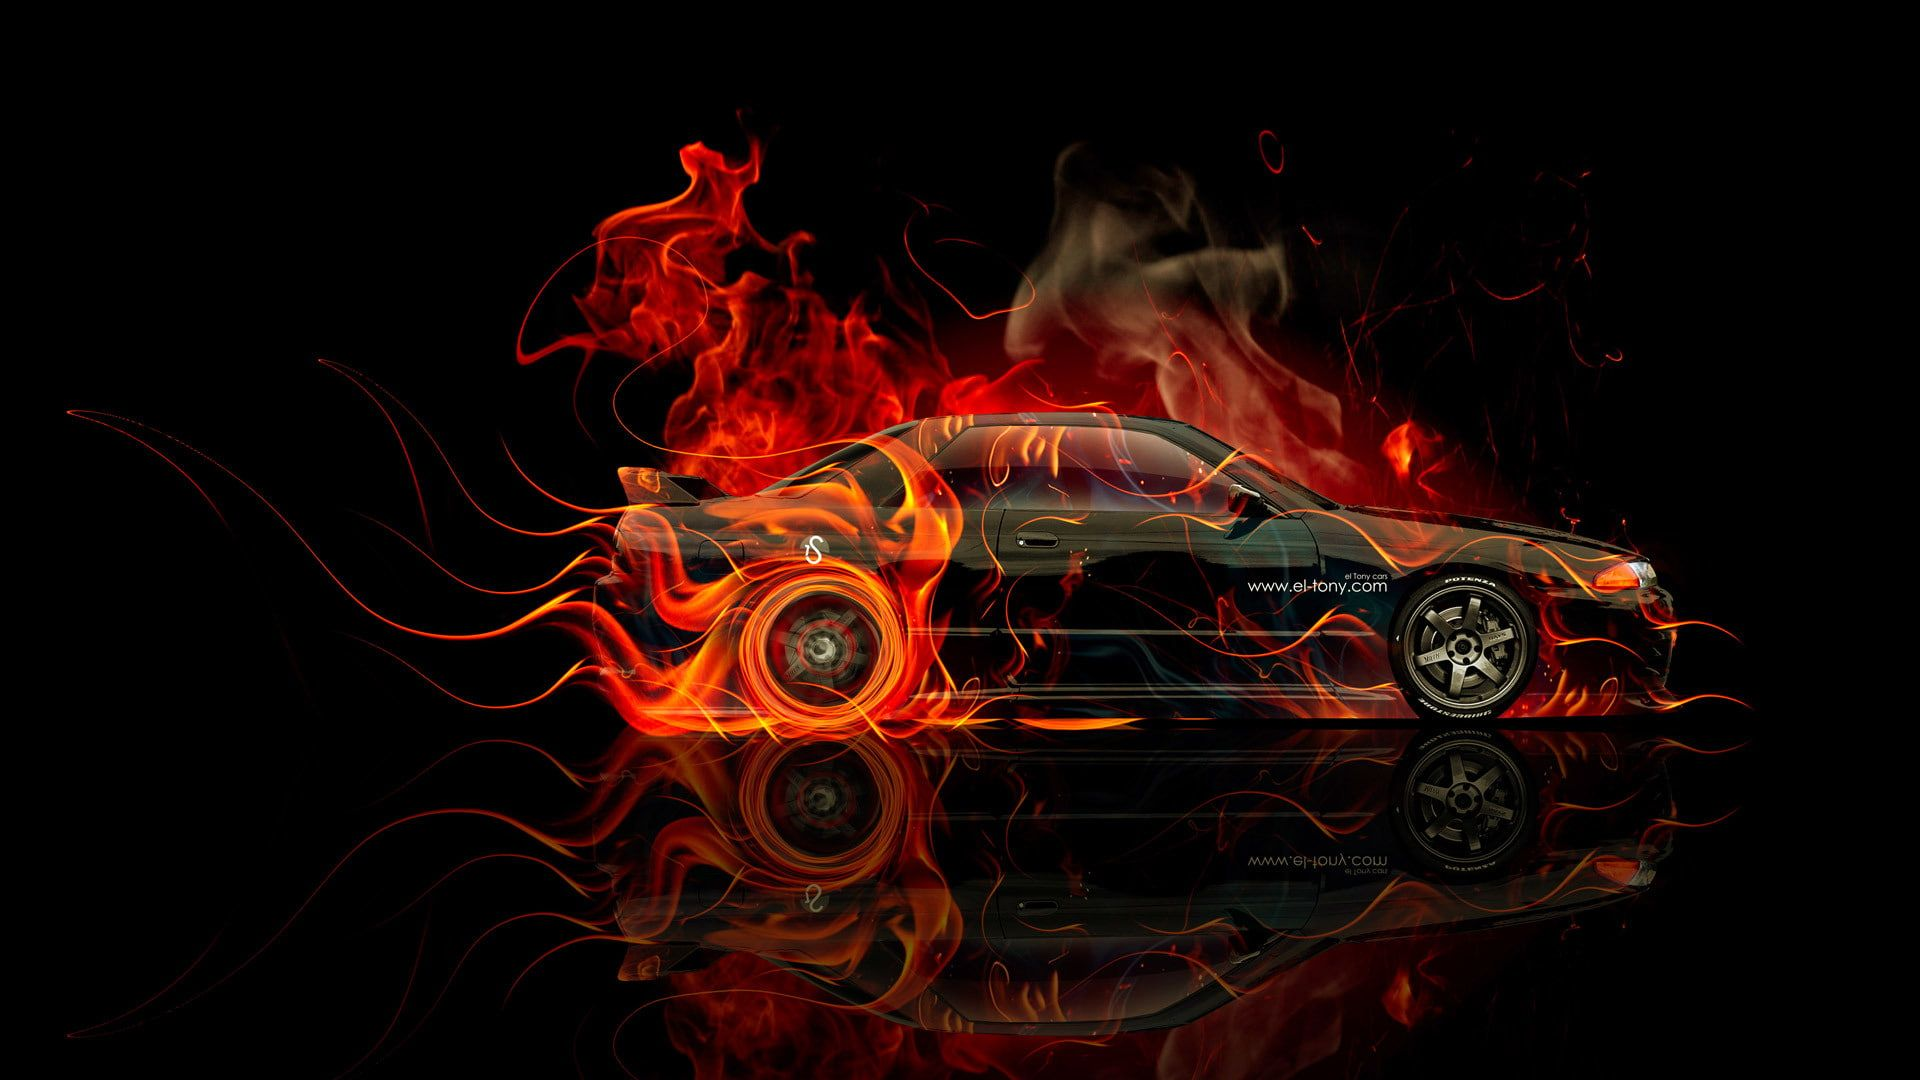 Download Fire Car Theme Mobile Themes Sony Ericsson Themes Mobile Fun Car Wallpapers Sports Car Wallpaper Car